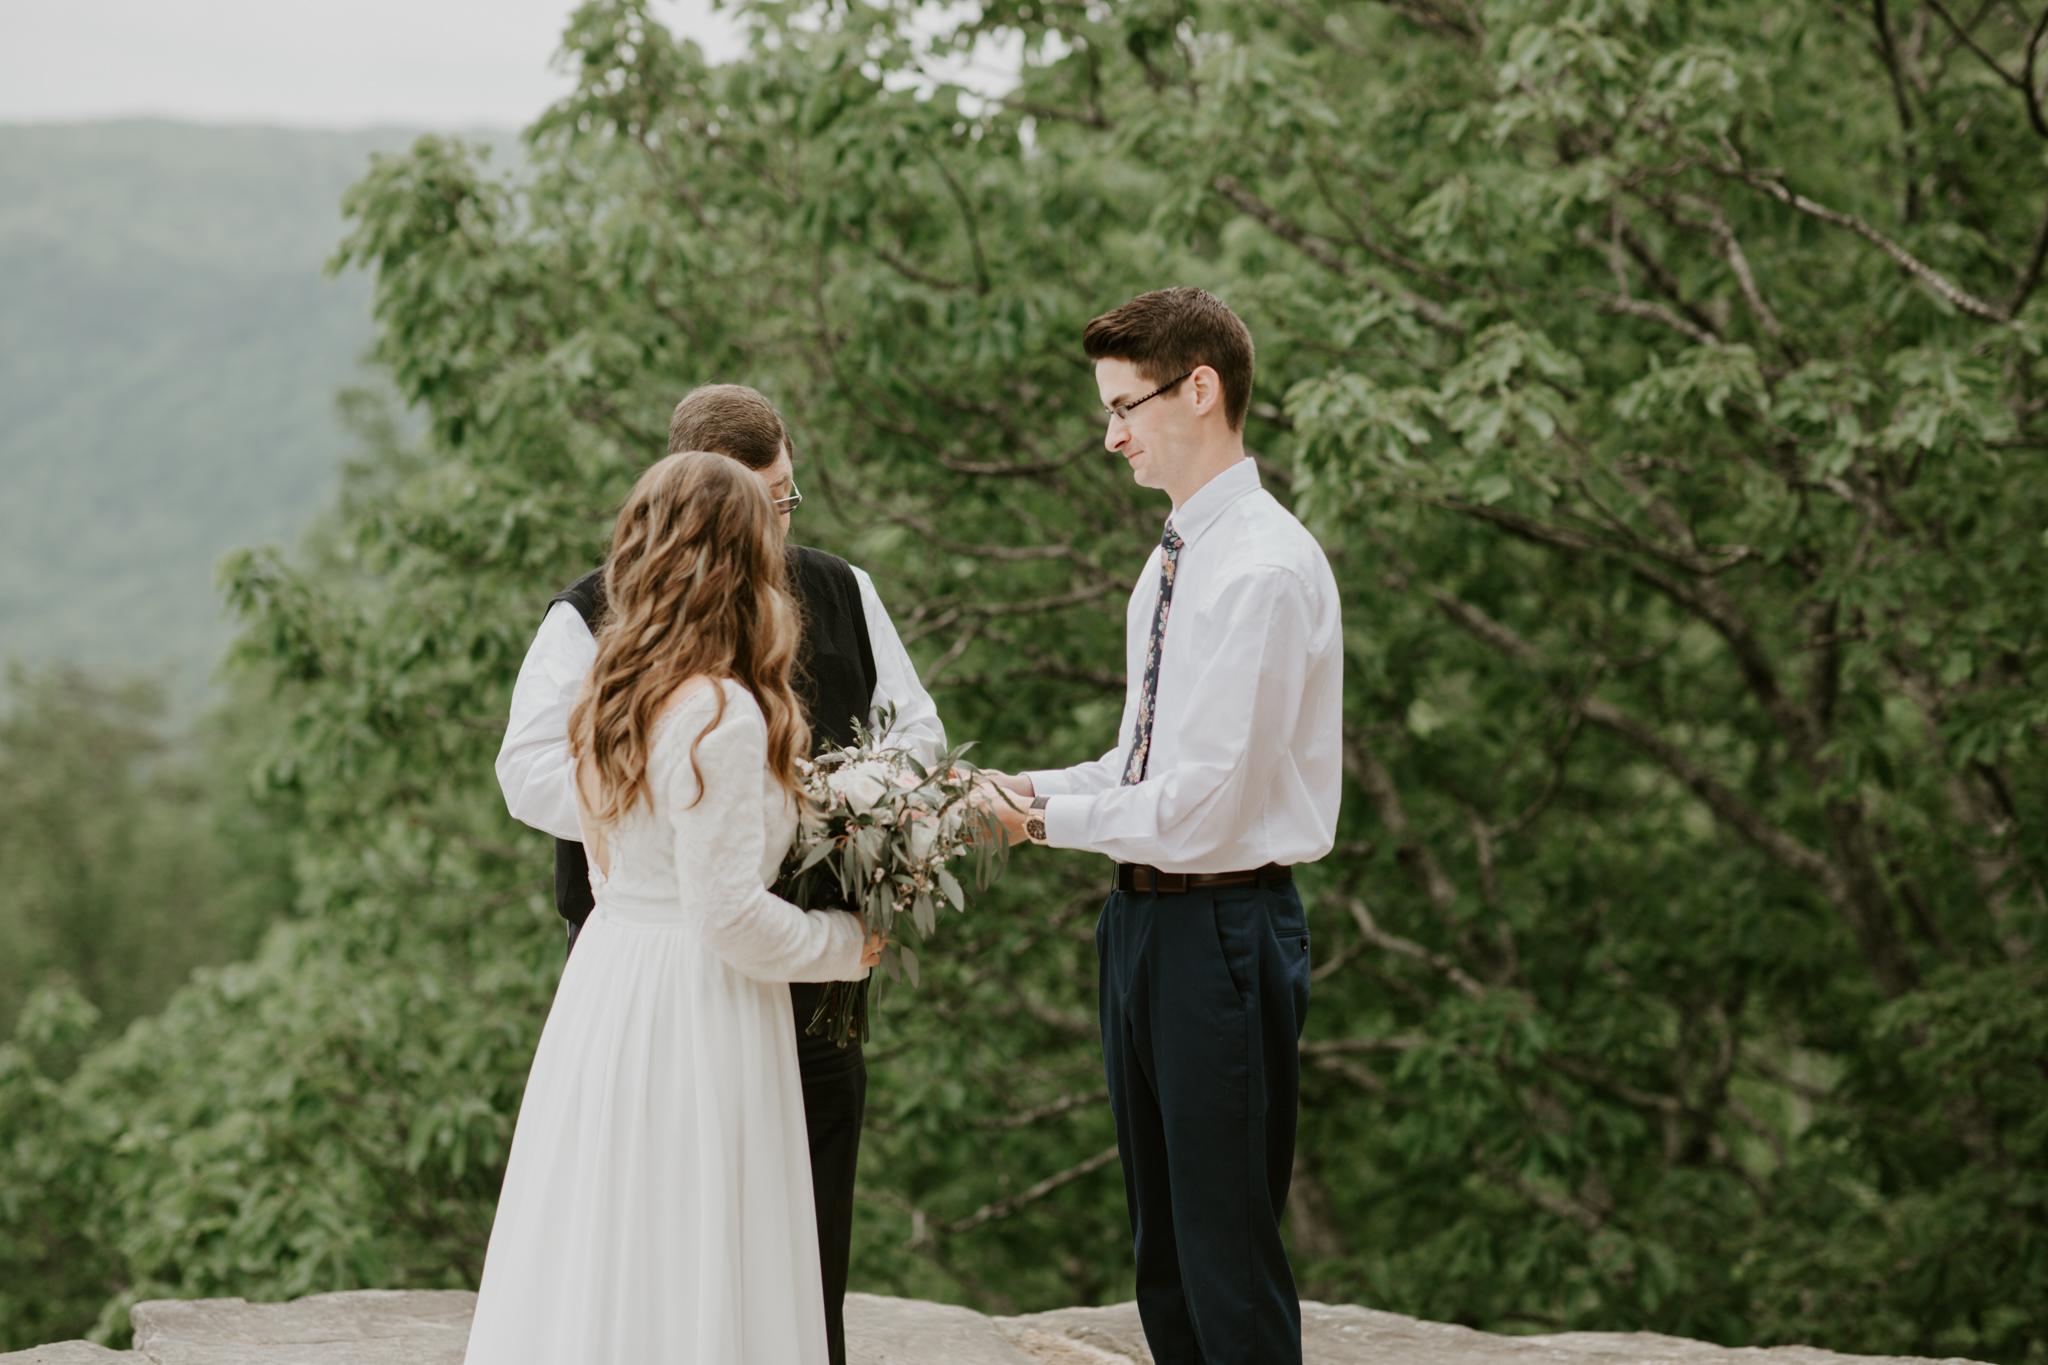 Lacey-Joe-Chattanooga-Nashville-Tennessee-Wedding-Elopement-Photographer-71.jpg